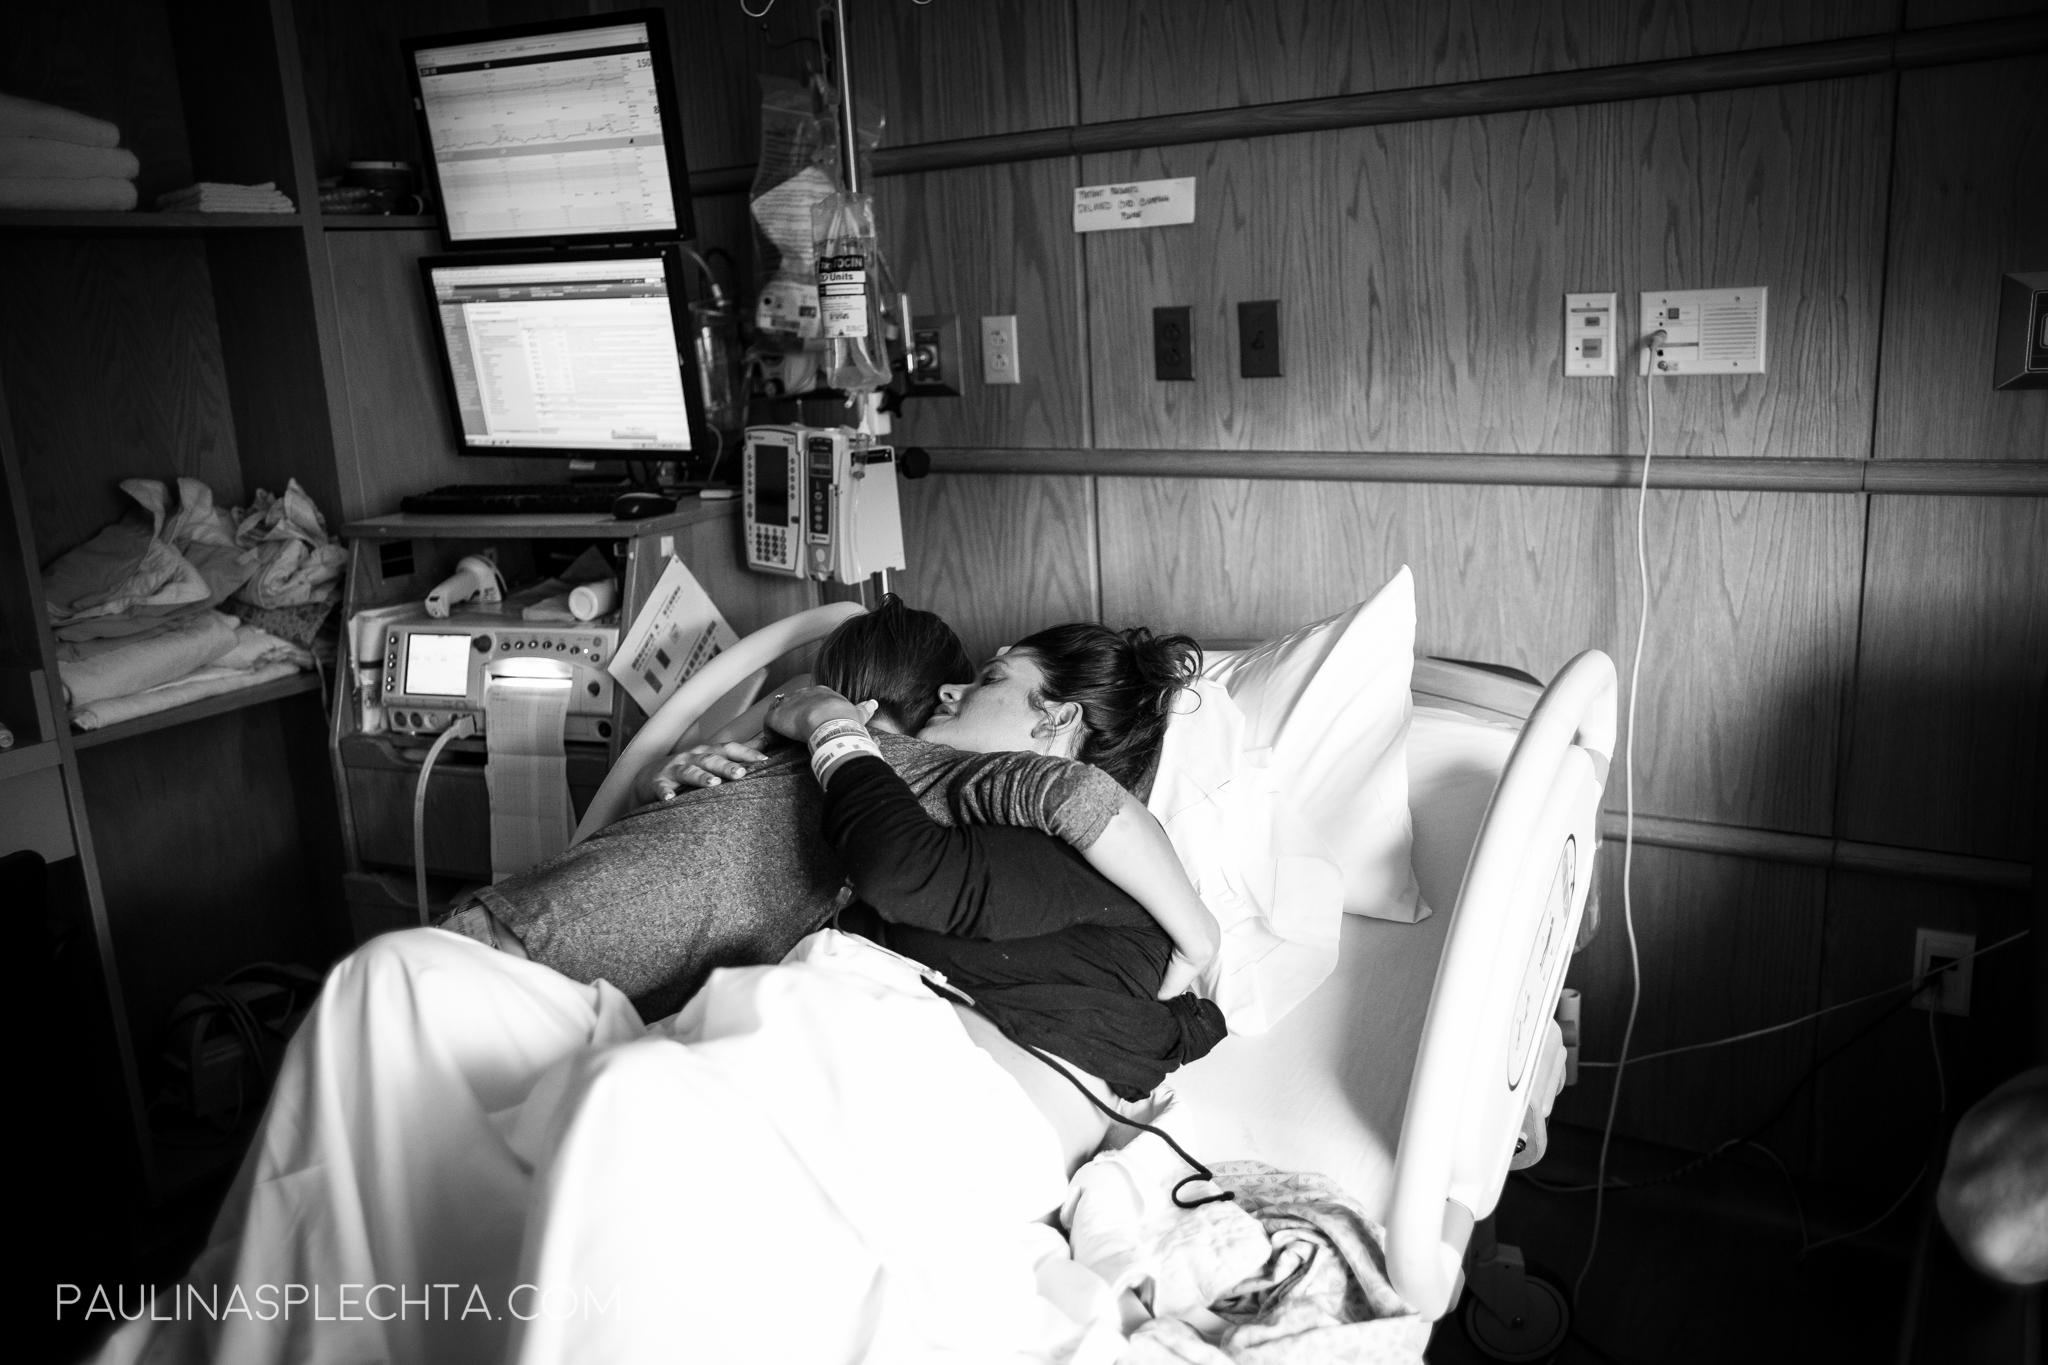 pregnant-duedate-breastfeeding-pregnancytest-pregnancysymptoms-morningsickness-delray-wellington-boynton-deerfieldbeach-northwest-westboca-coralspringsmedicalcenter-vbacmidwife-gestationaldiabetes-induced-lactationconsultant-preggo-edd-46.jpg